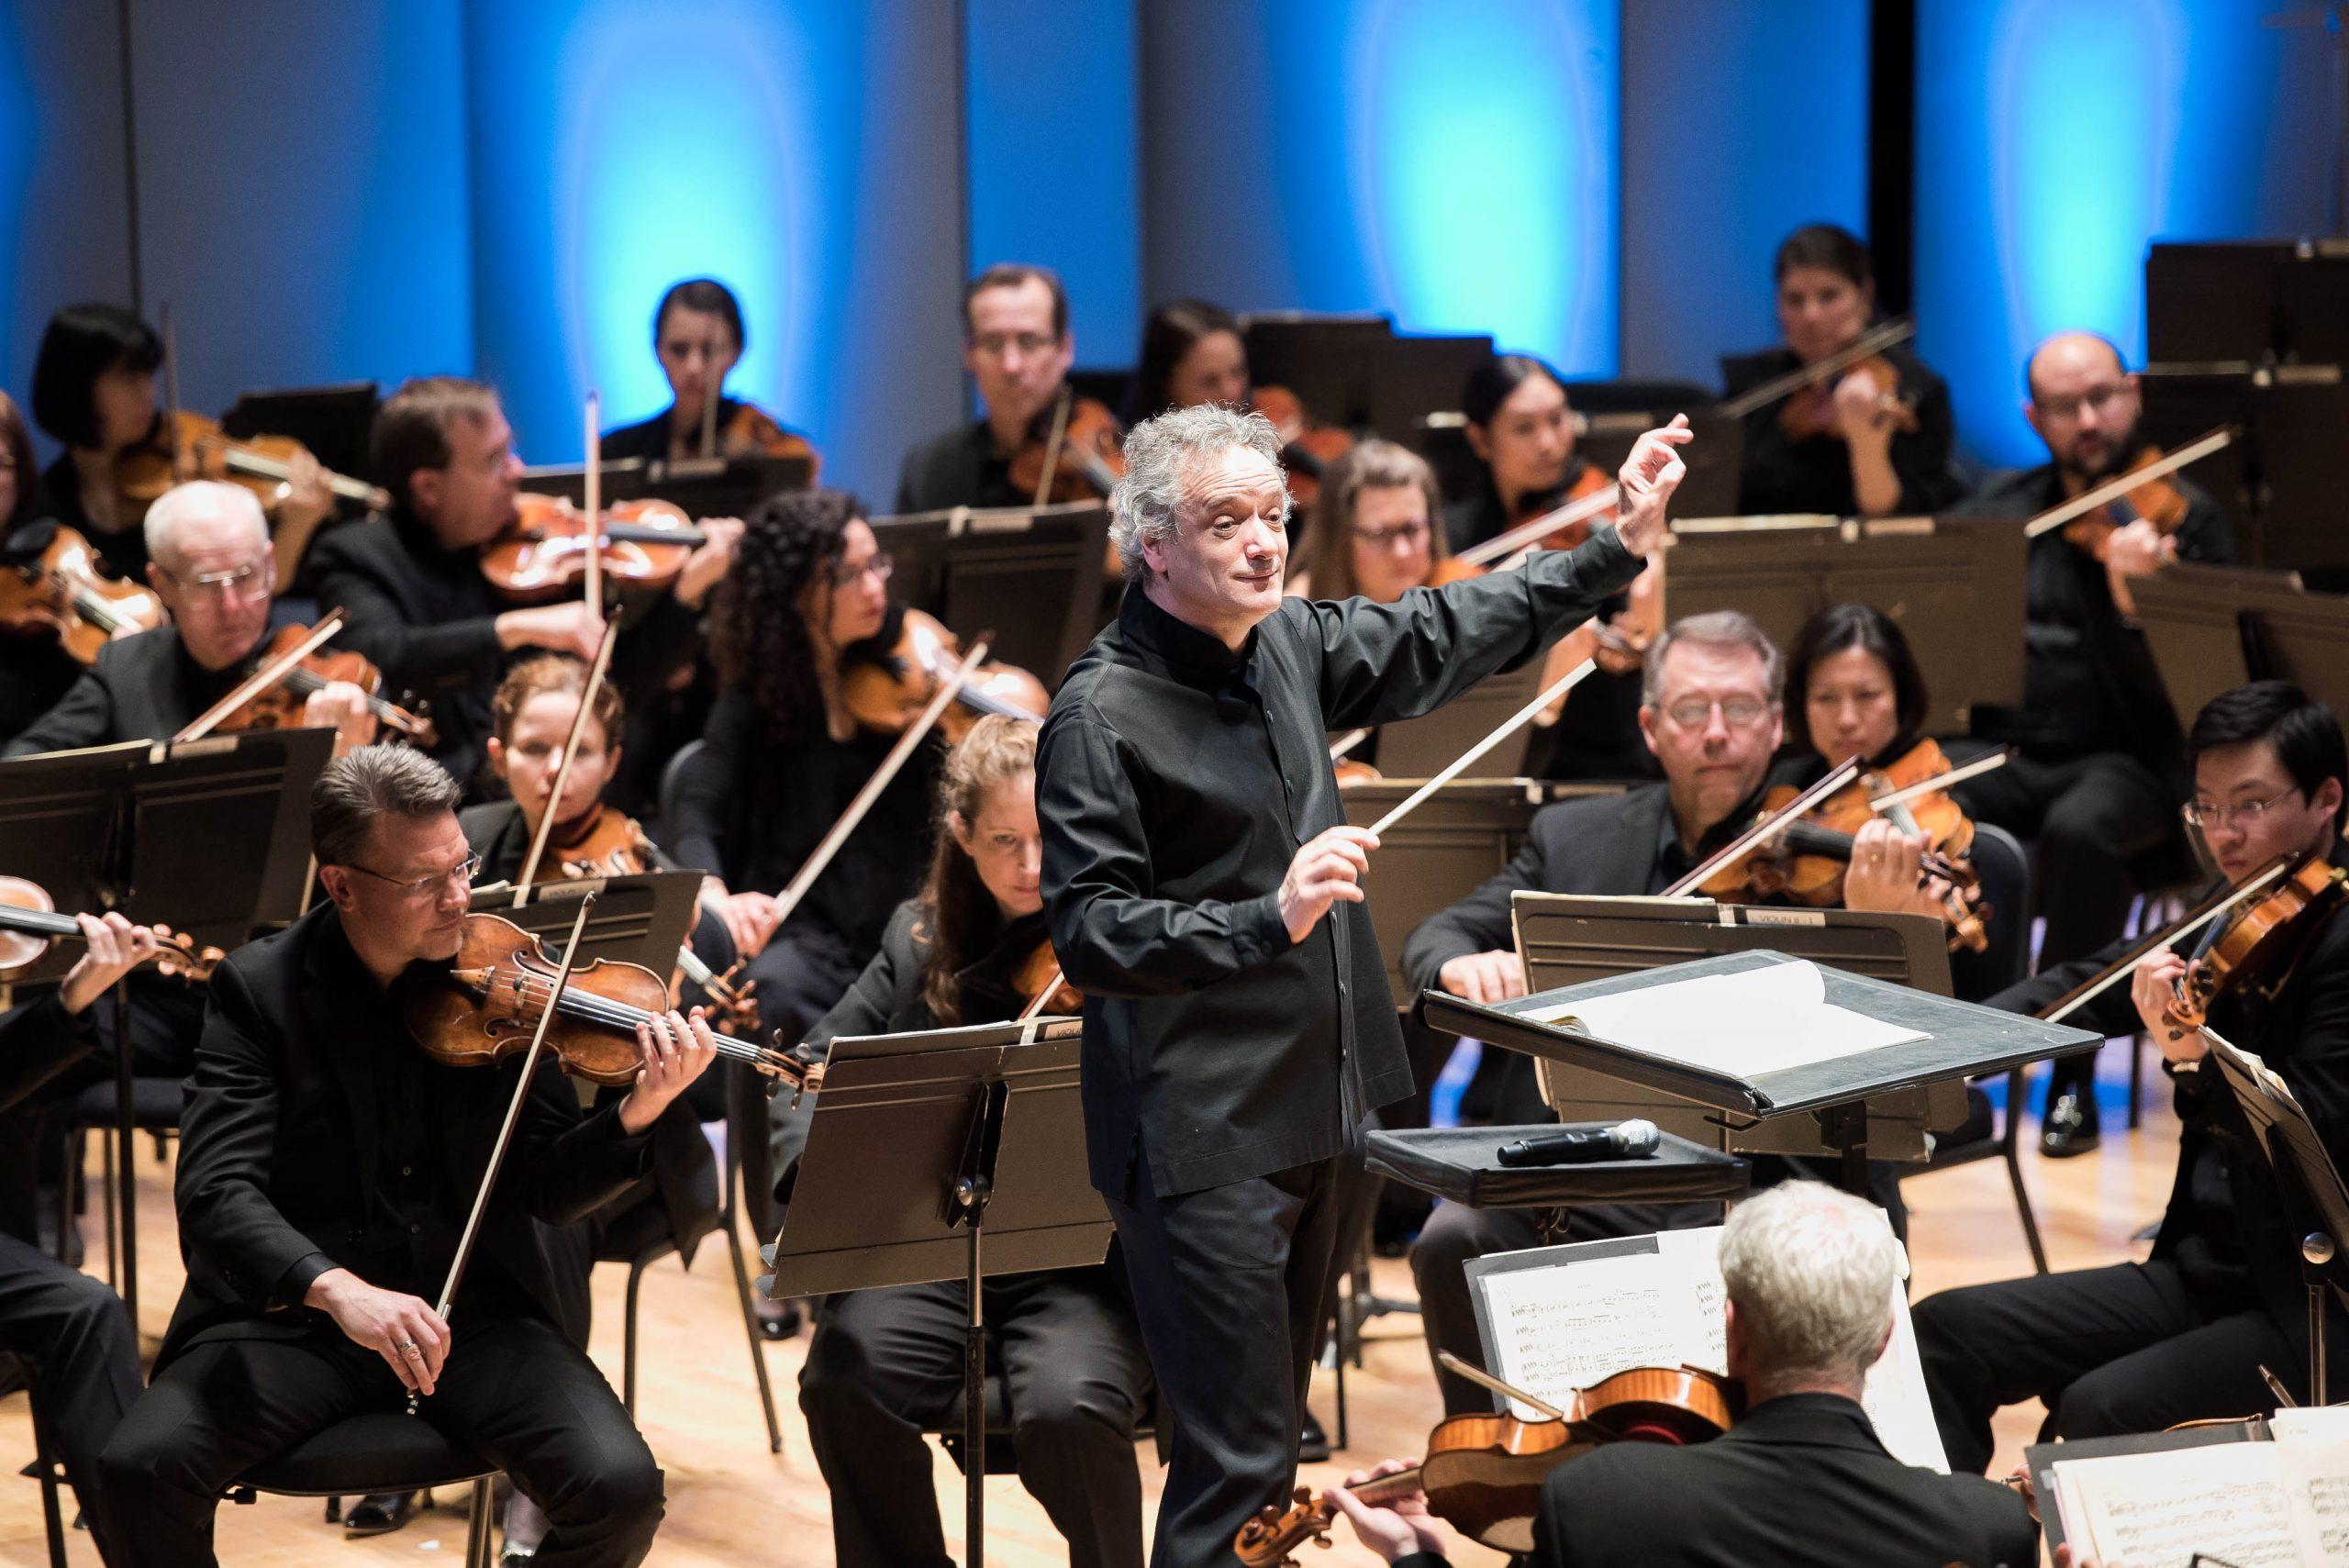 Cincinnati Symphony Orchestra conductor